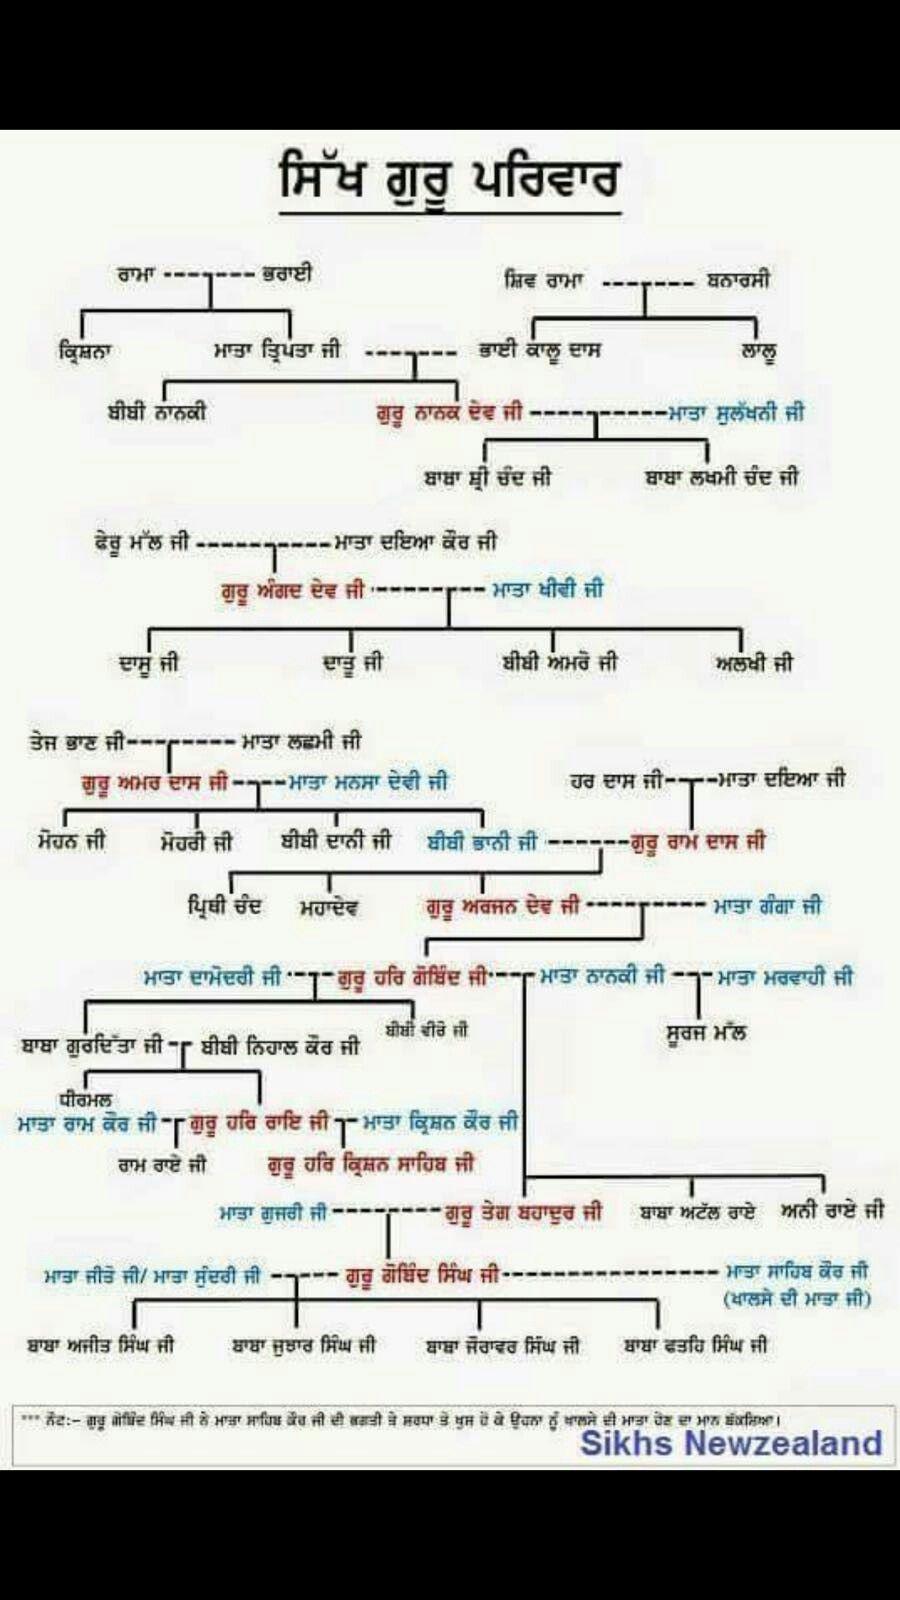 how to write sikh in punjabi